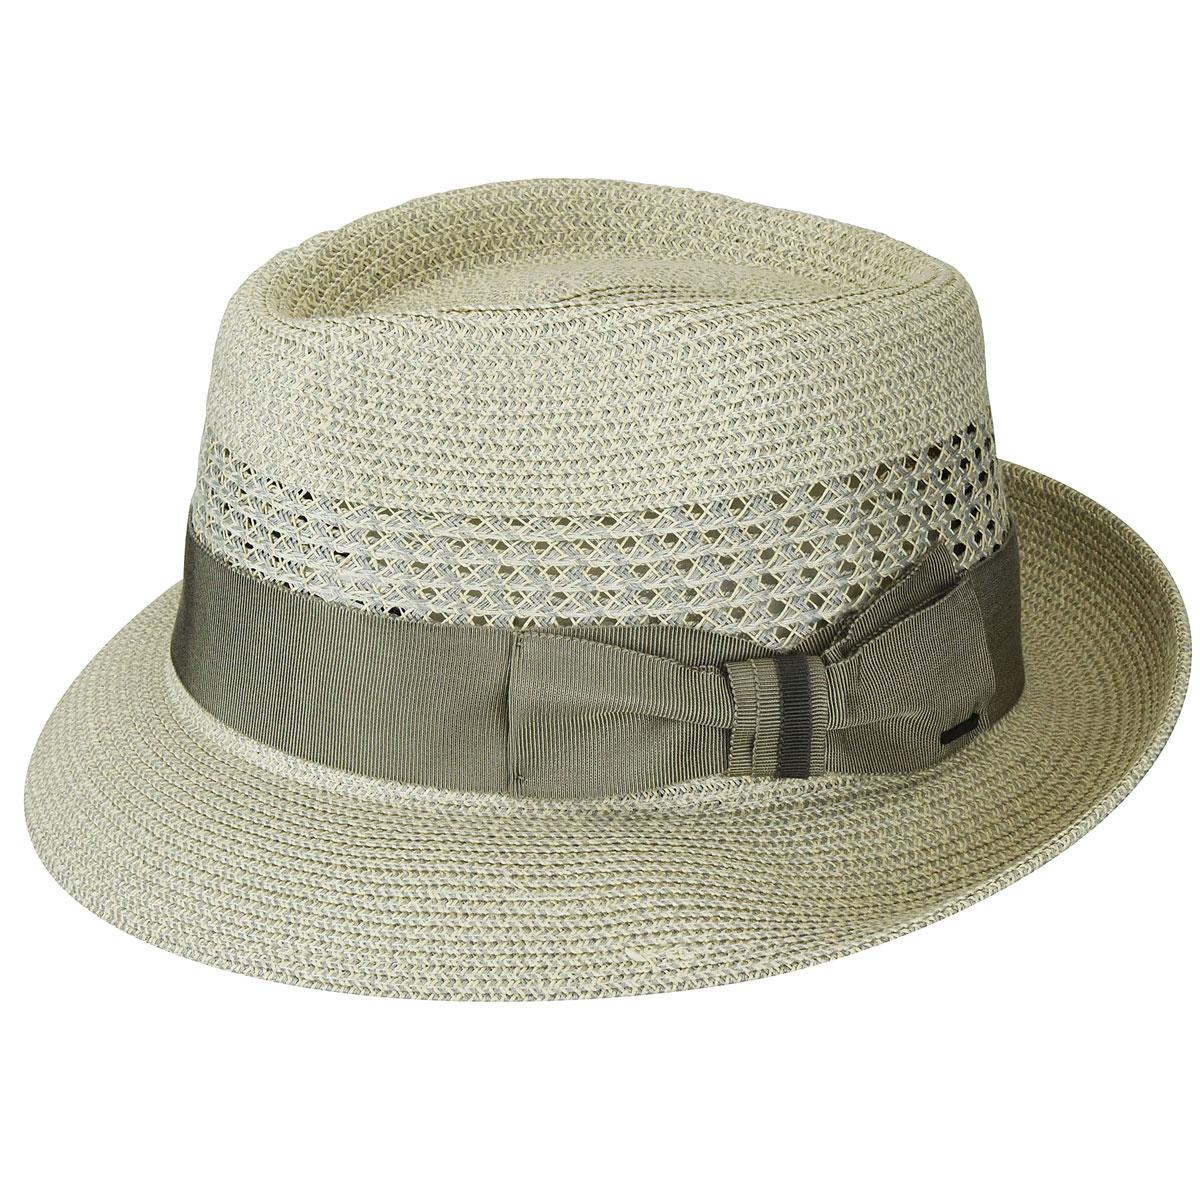 96f747fd 1950s Mens Hats | 50s Vintage Men's Hats Wilshire Braided Fedora $70.00 AT  vintagedancer.com